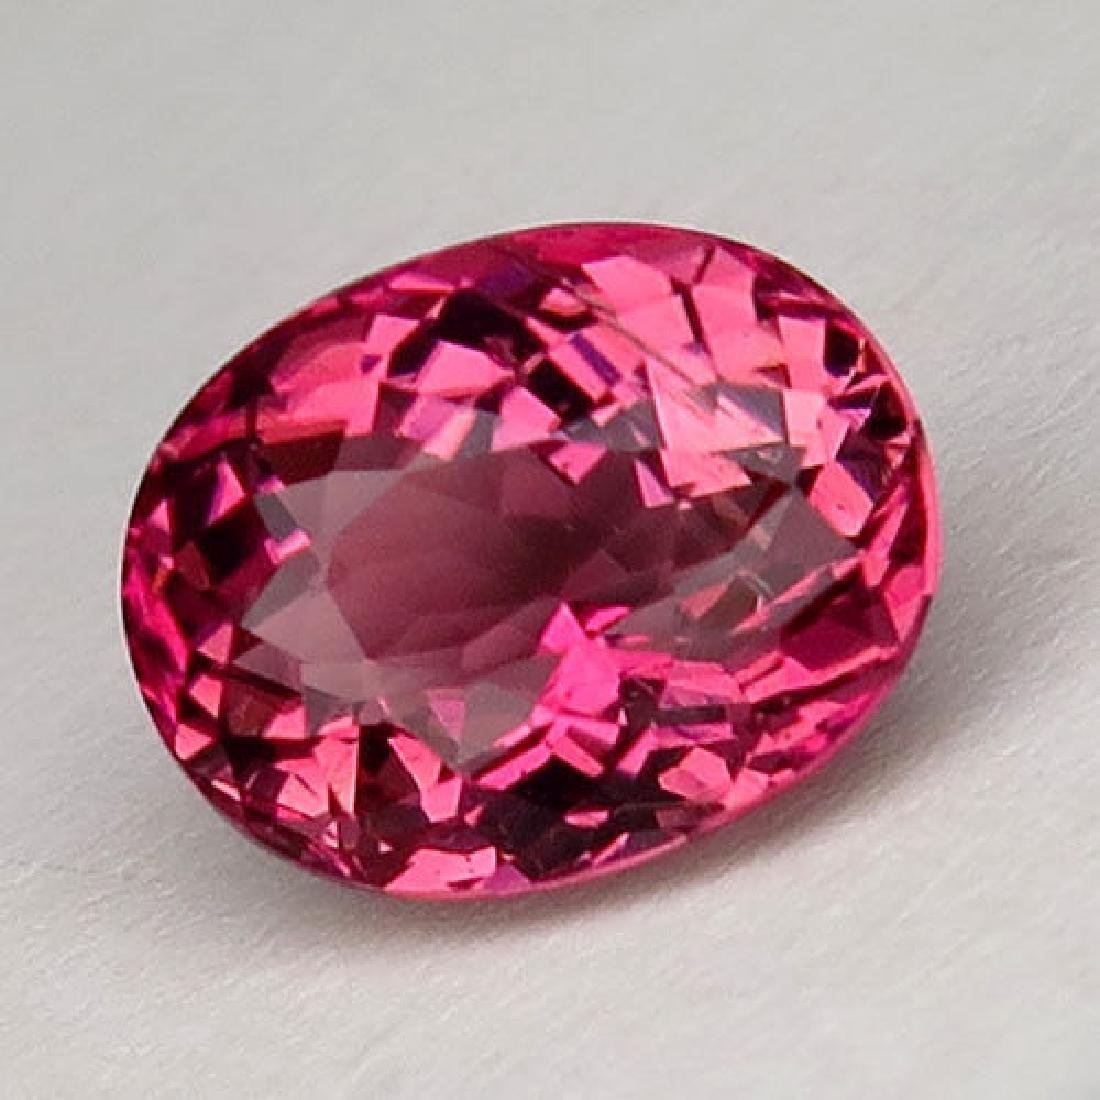 Natural Pink Tourmaline 2.25 cts - VVS